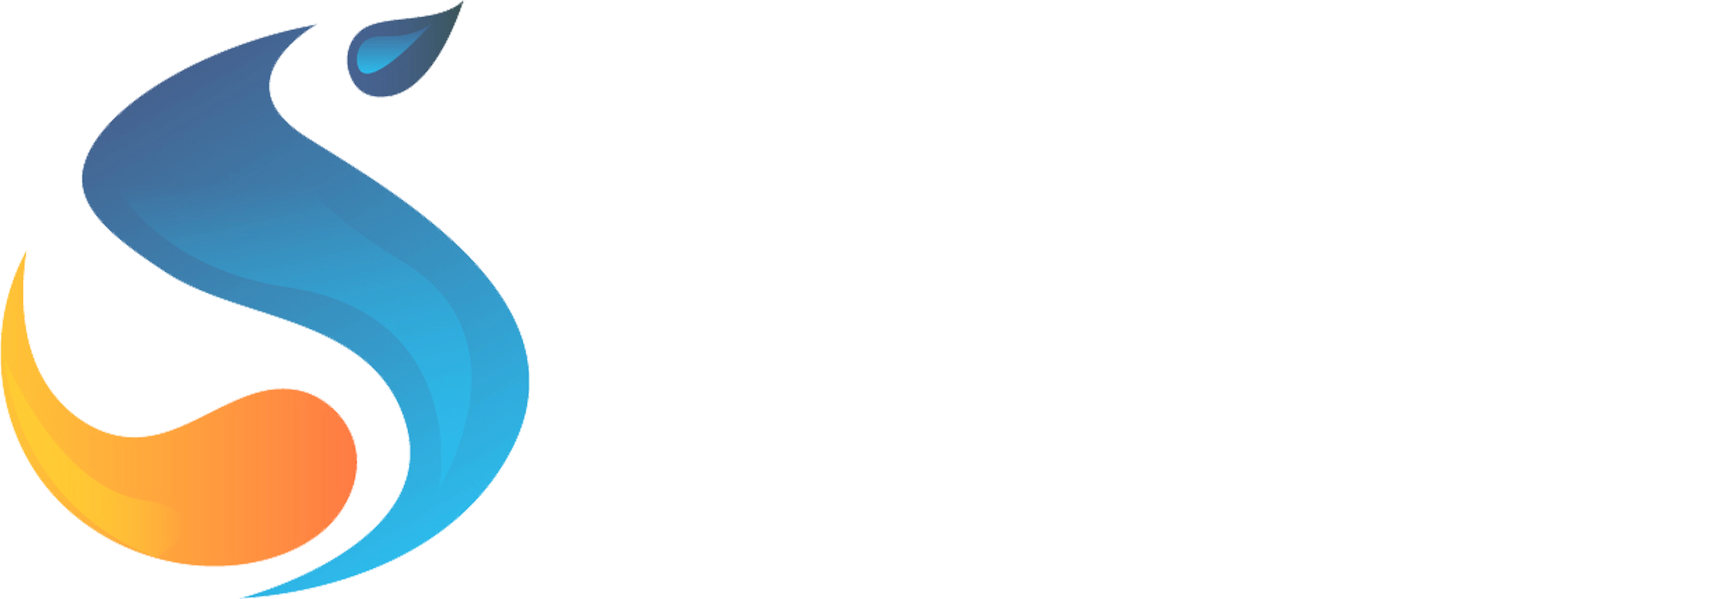 Free salon booking app